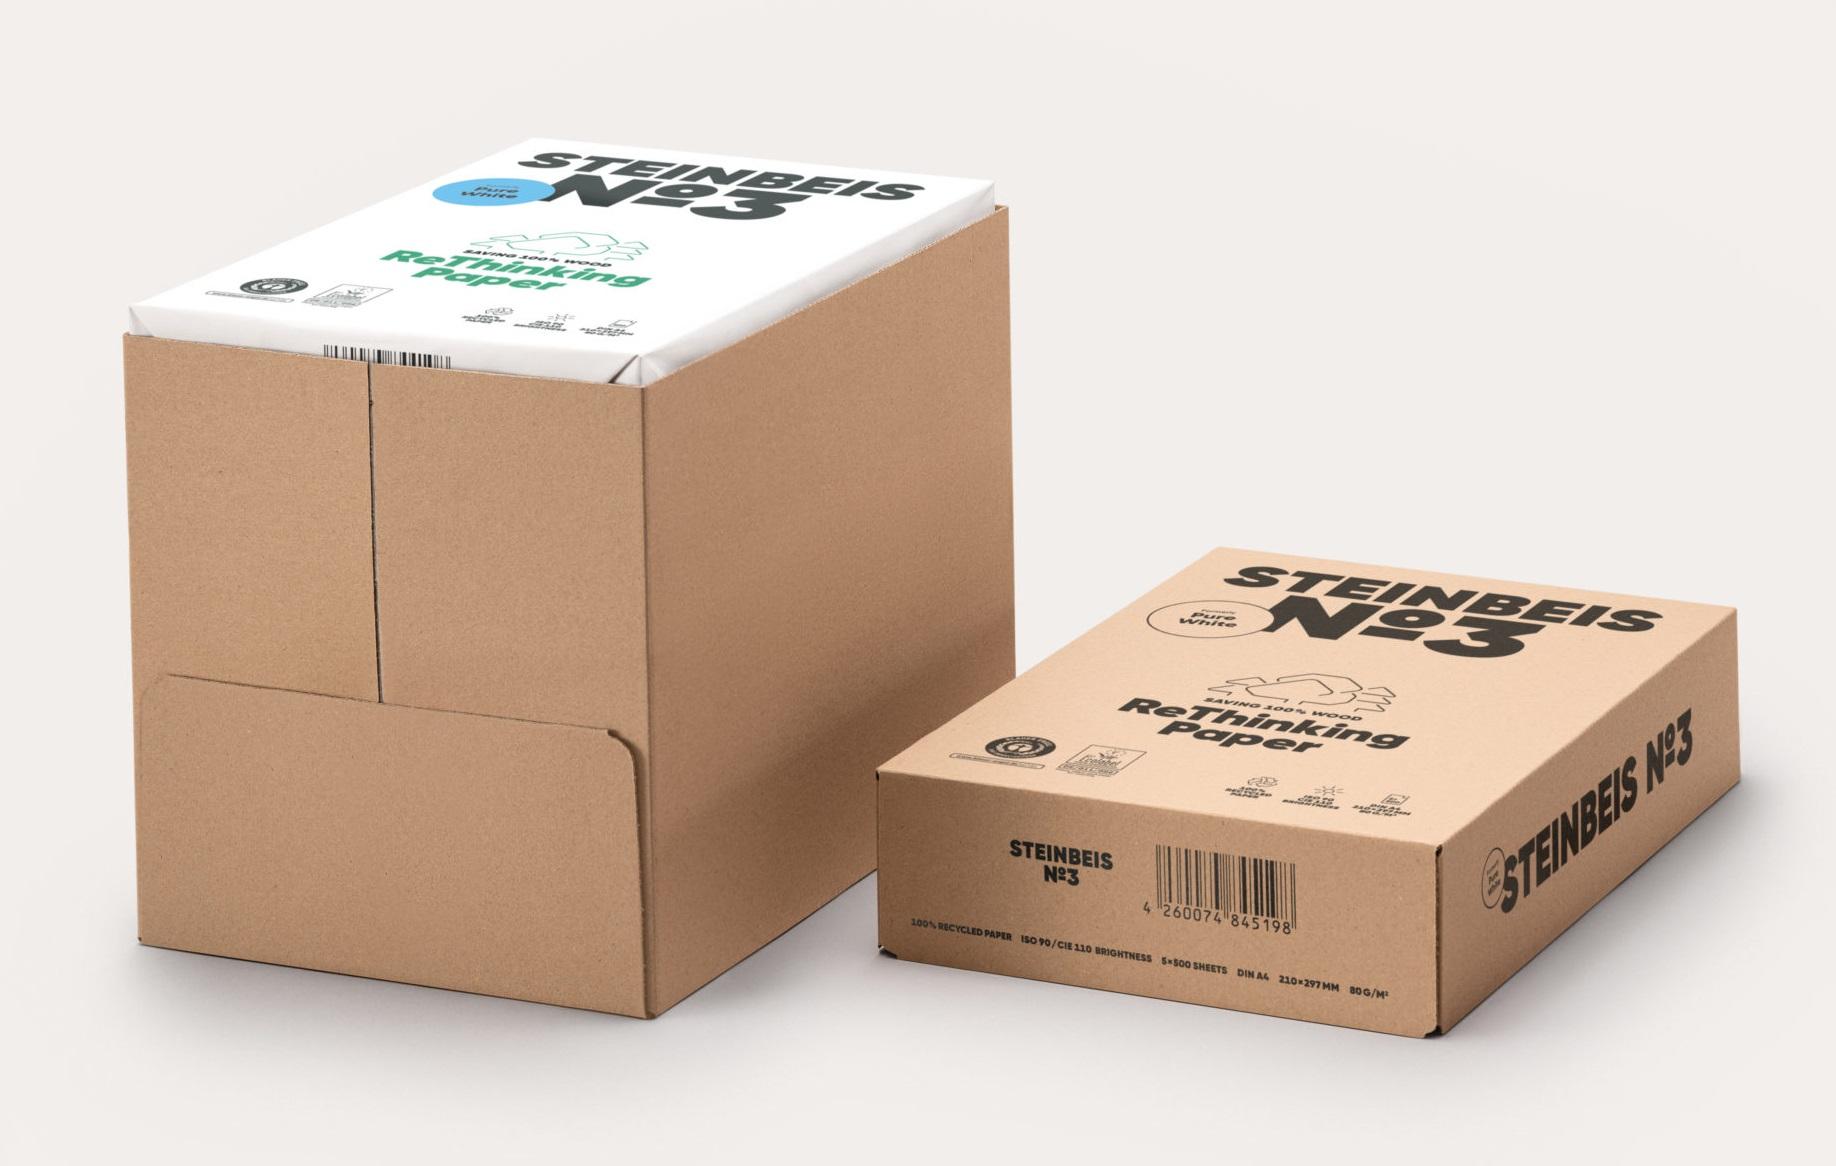 2500 Blatt Steinbeis No 3 - Pure White 80g/m² DIN-A4 100% Recycling